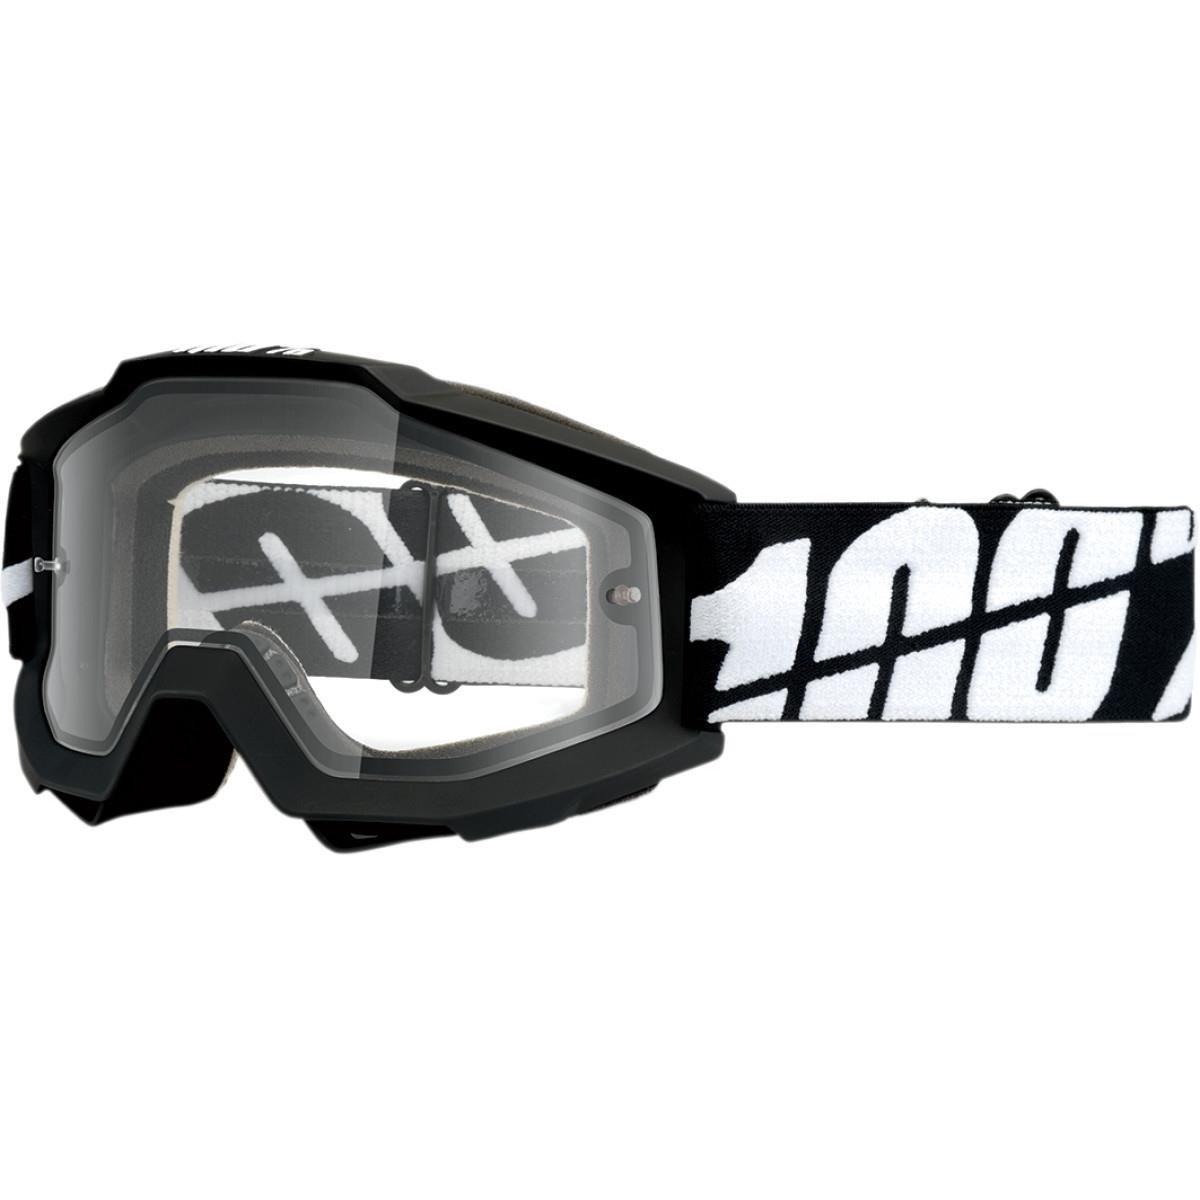 f90af7c5220 Amazon.com  100% Accuri Men s Off-Road Dirt Bike Motorcycle Goggles Eyewear  - Black Tornado Clear Dual Lens   One Size  Automotive